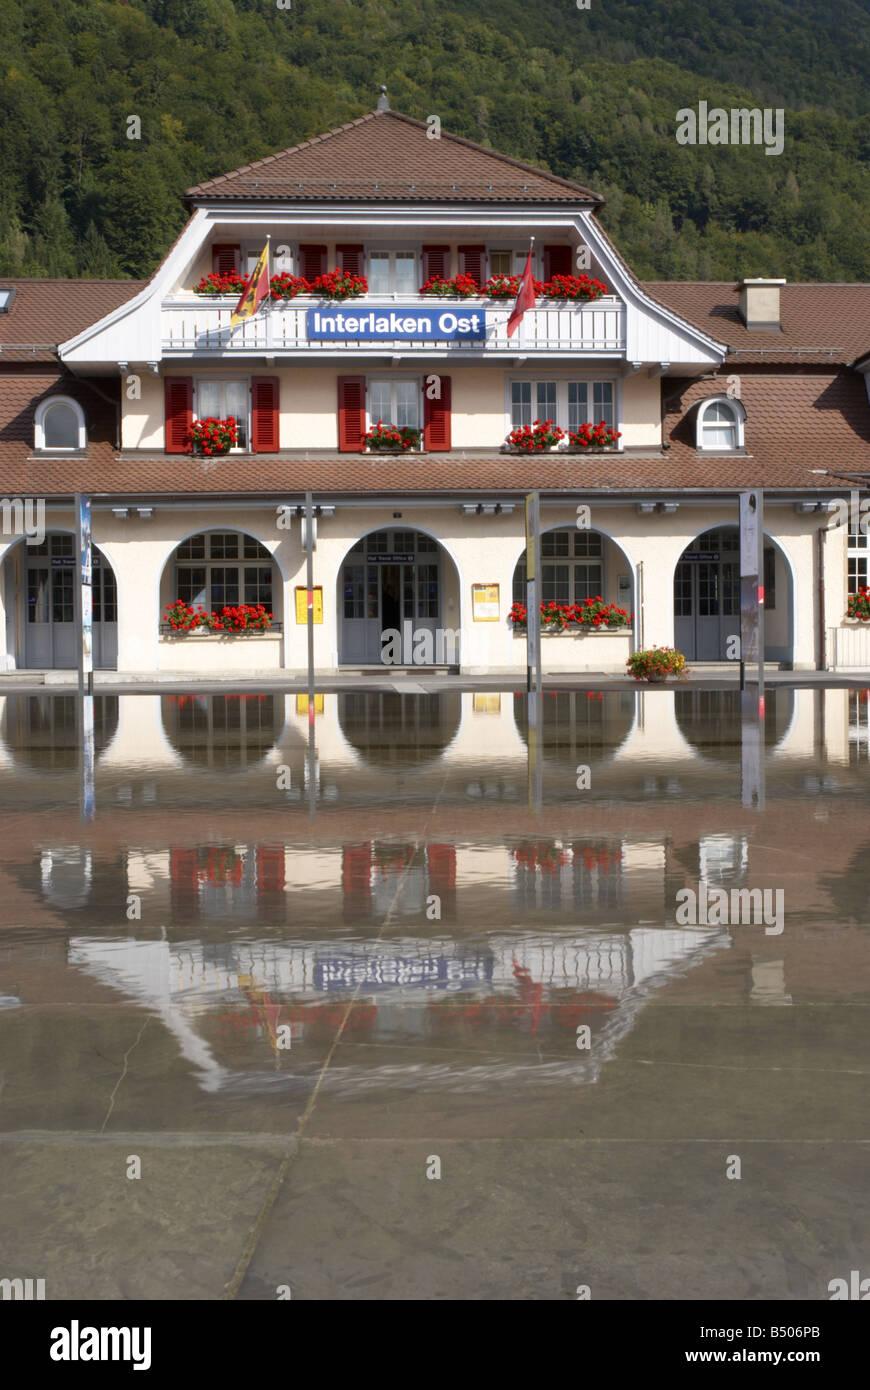 Reflections and Interlaken Ost Railway Station Switzerland - Stock Image